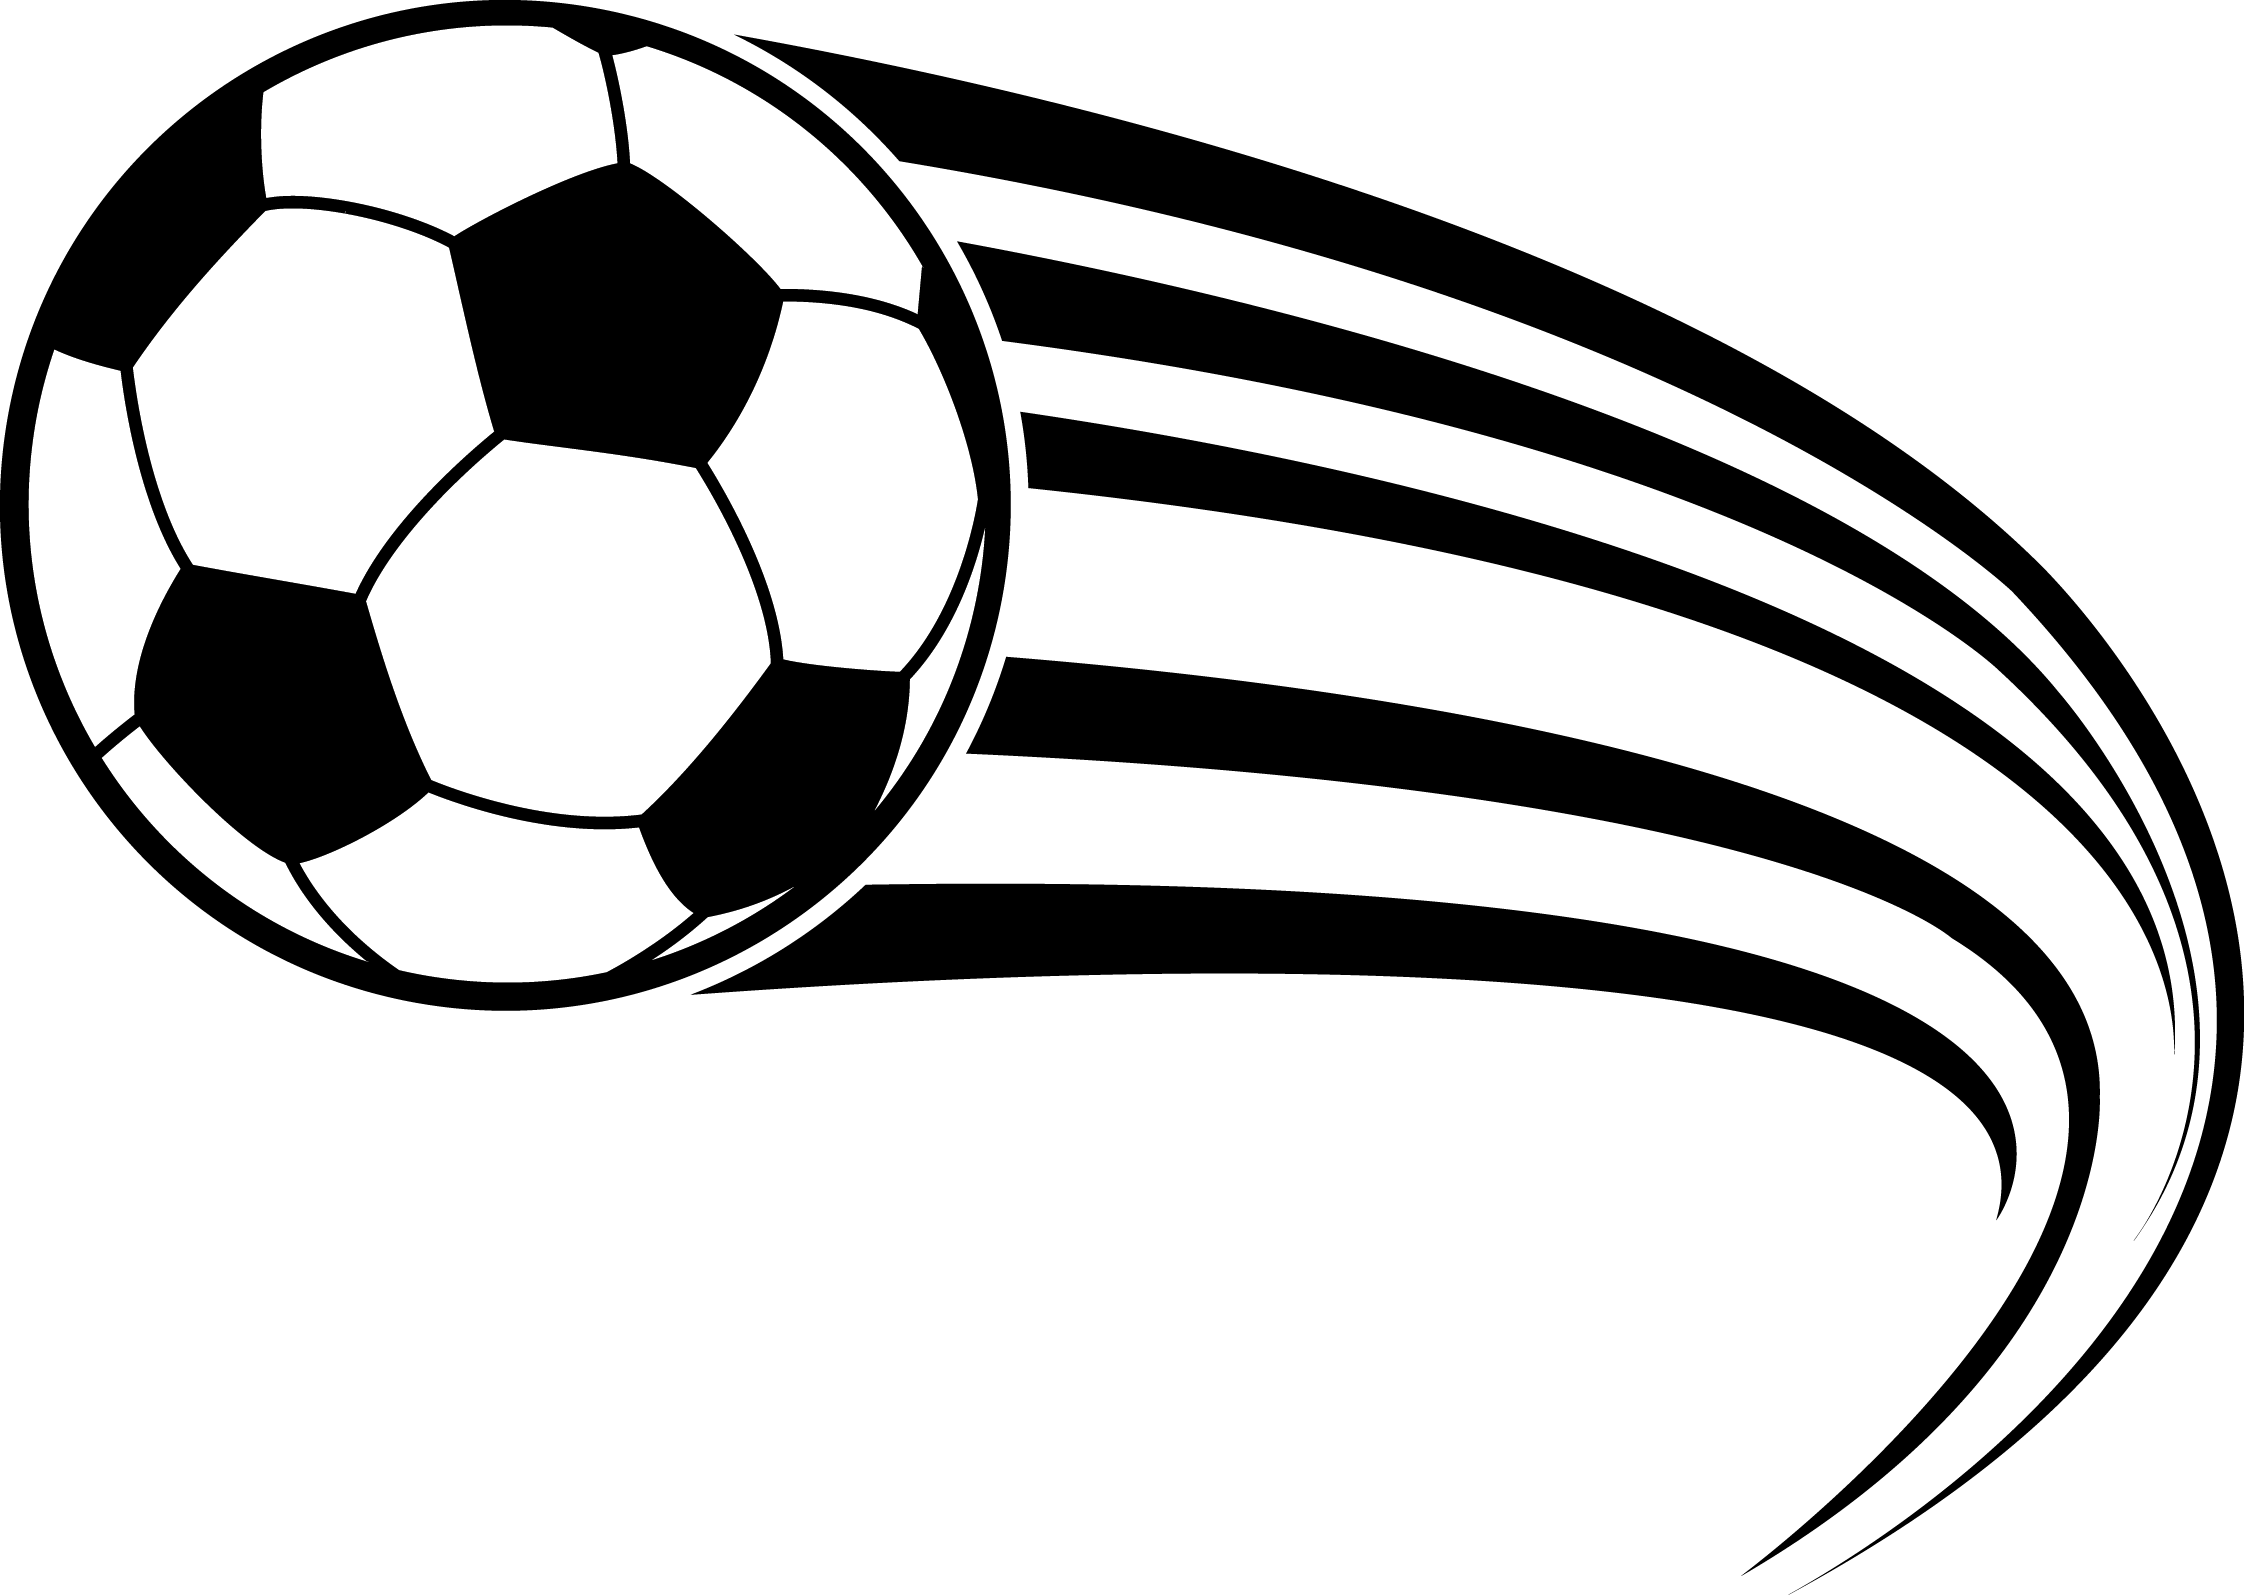 Play clipart football team. Dribbling clip art transprent